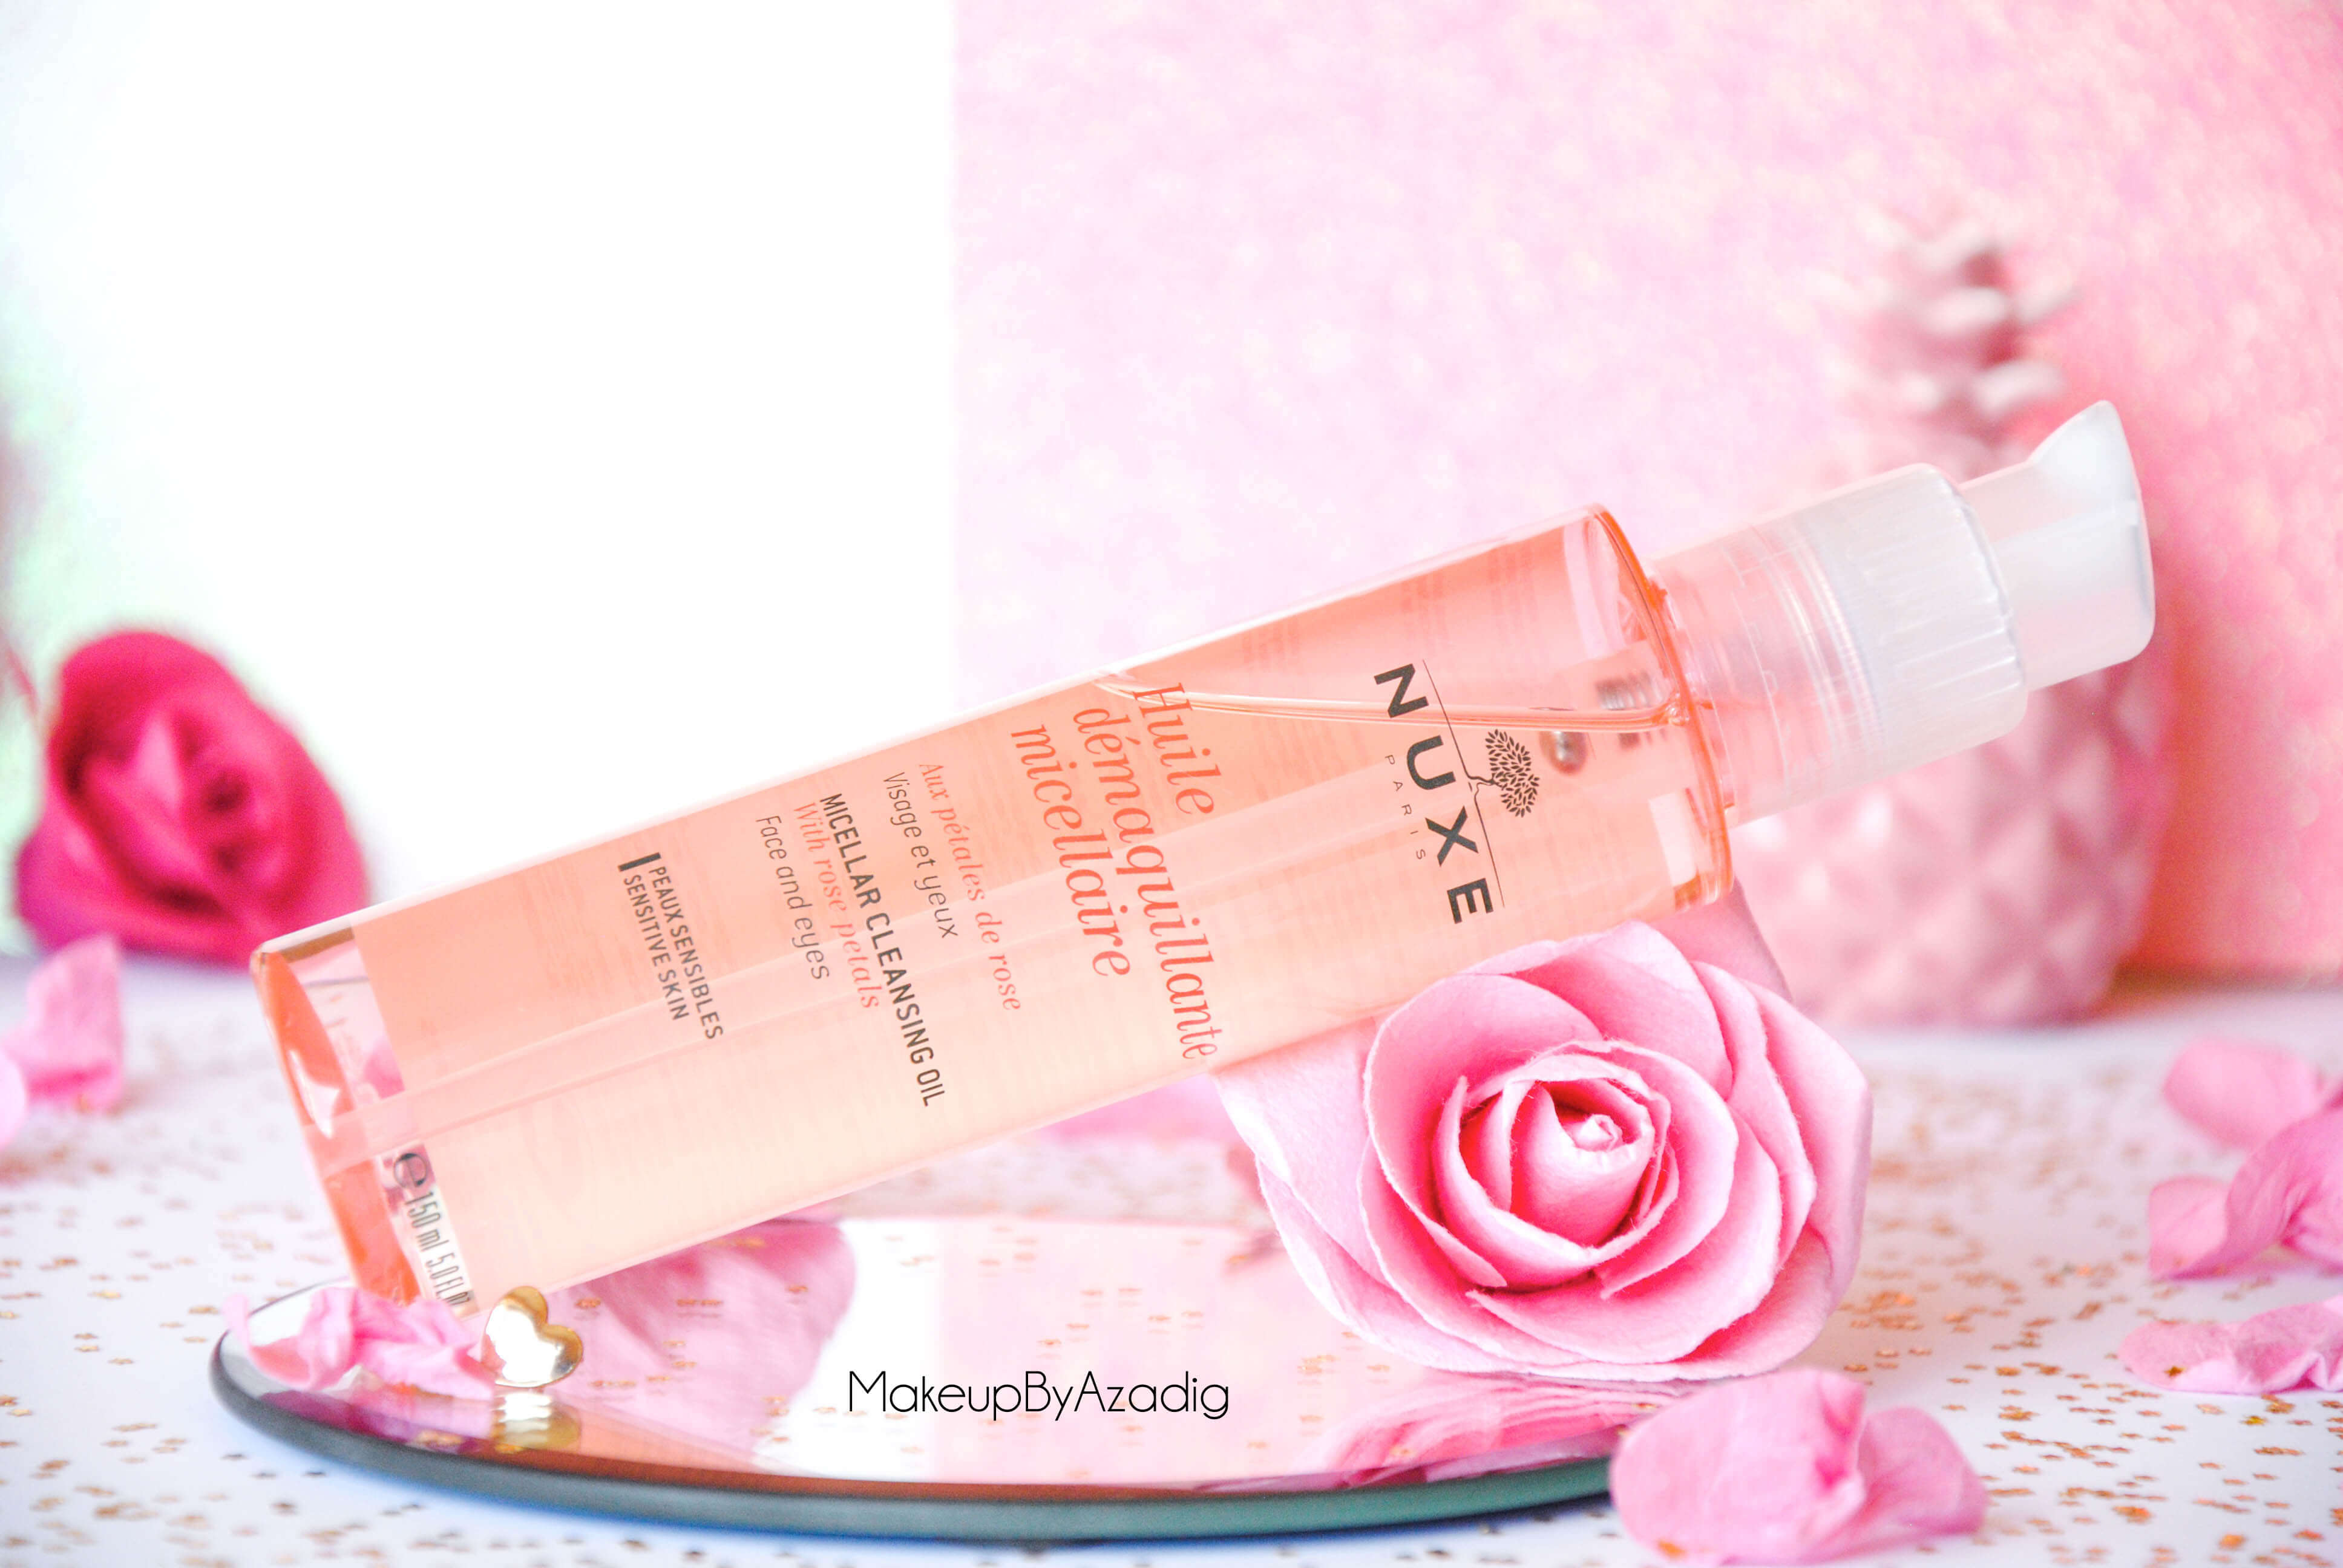 makeupbyazadig-huile-demaquillante-micellaire-nuxe-petales-de-rose-doctipharma-revue-avis-prix-visage